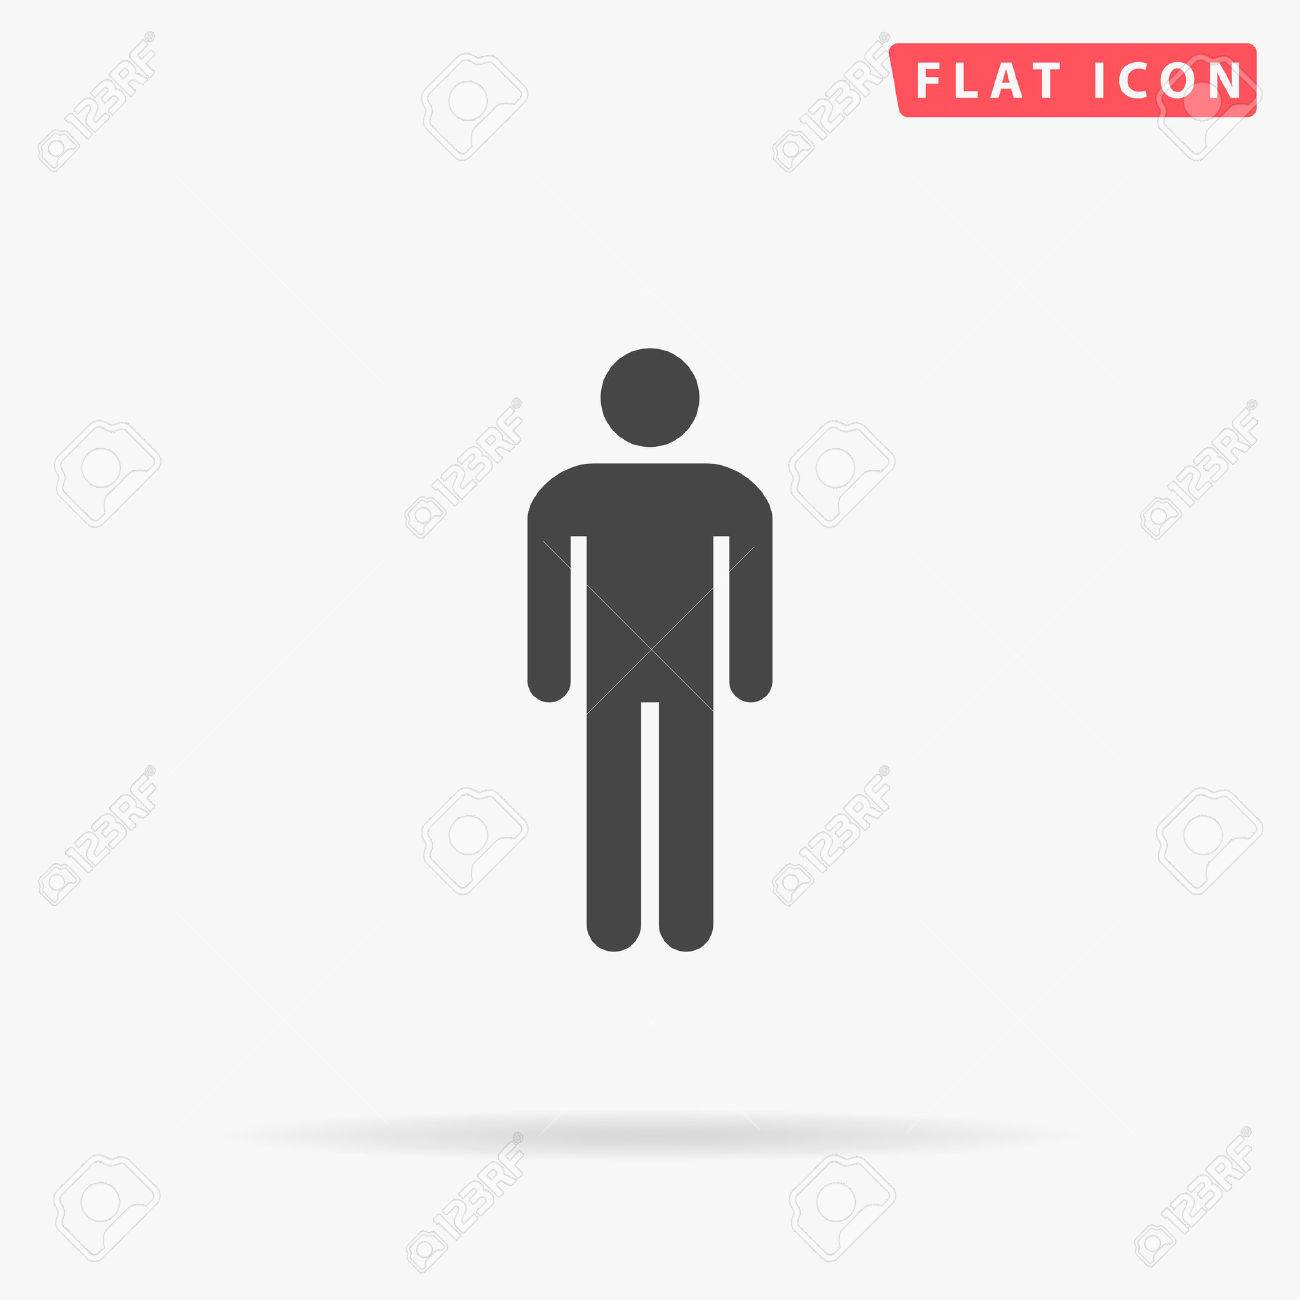 Man Icon. Man Icon Vector. Man Icon JPEG. Man Icon Object. Man Icon Picture. Man Icon Image. Man Icon Graphic. Man Icon Art. Man Icon JPG. Man Icon EPS. Man Icon AI. Man Icon Drawing - 51165118